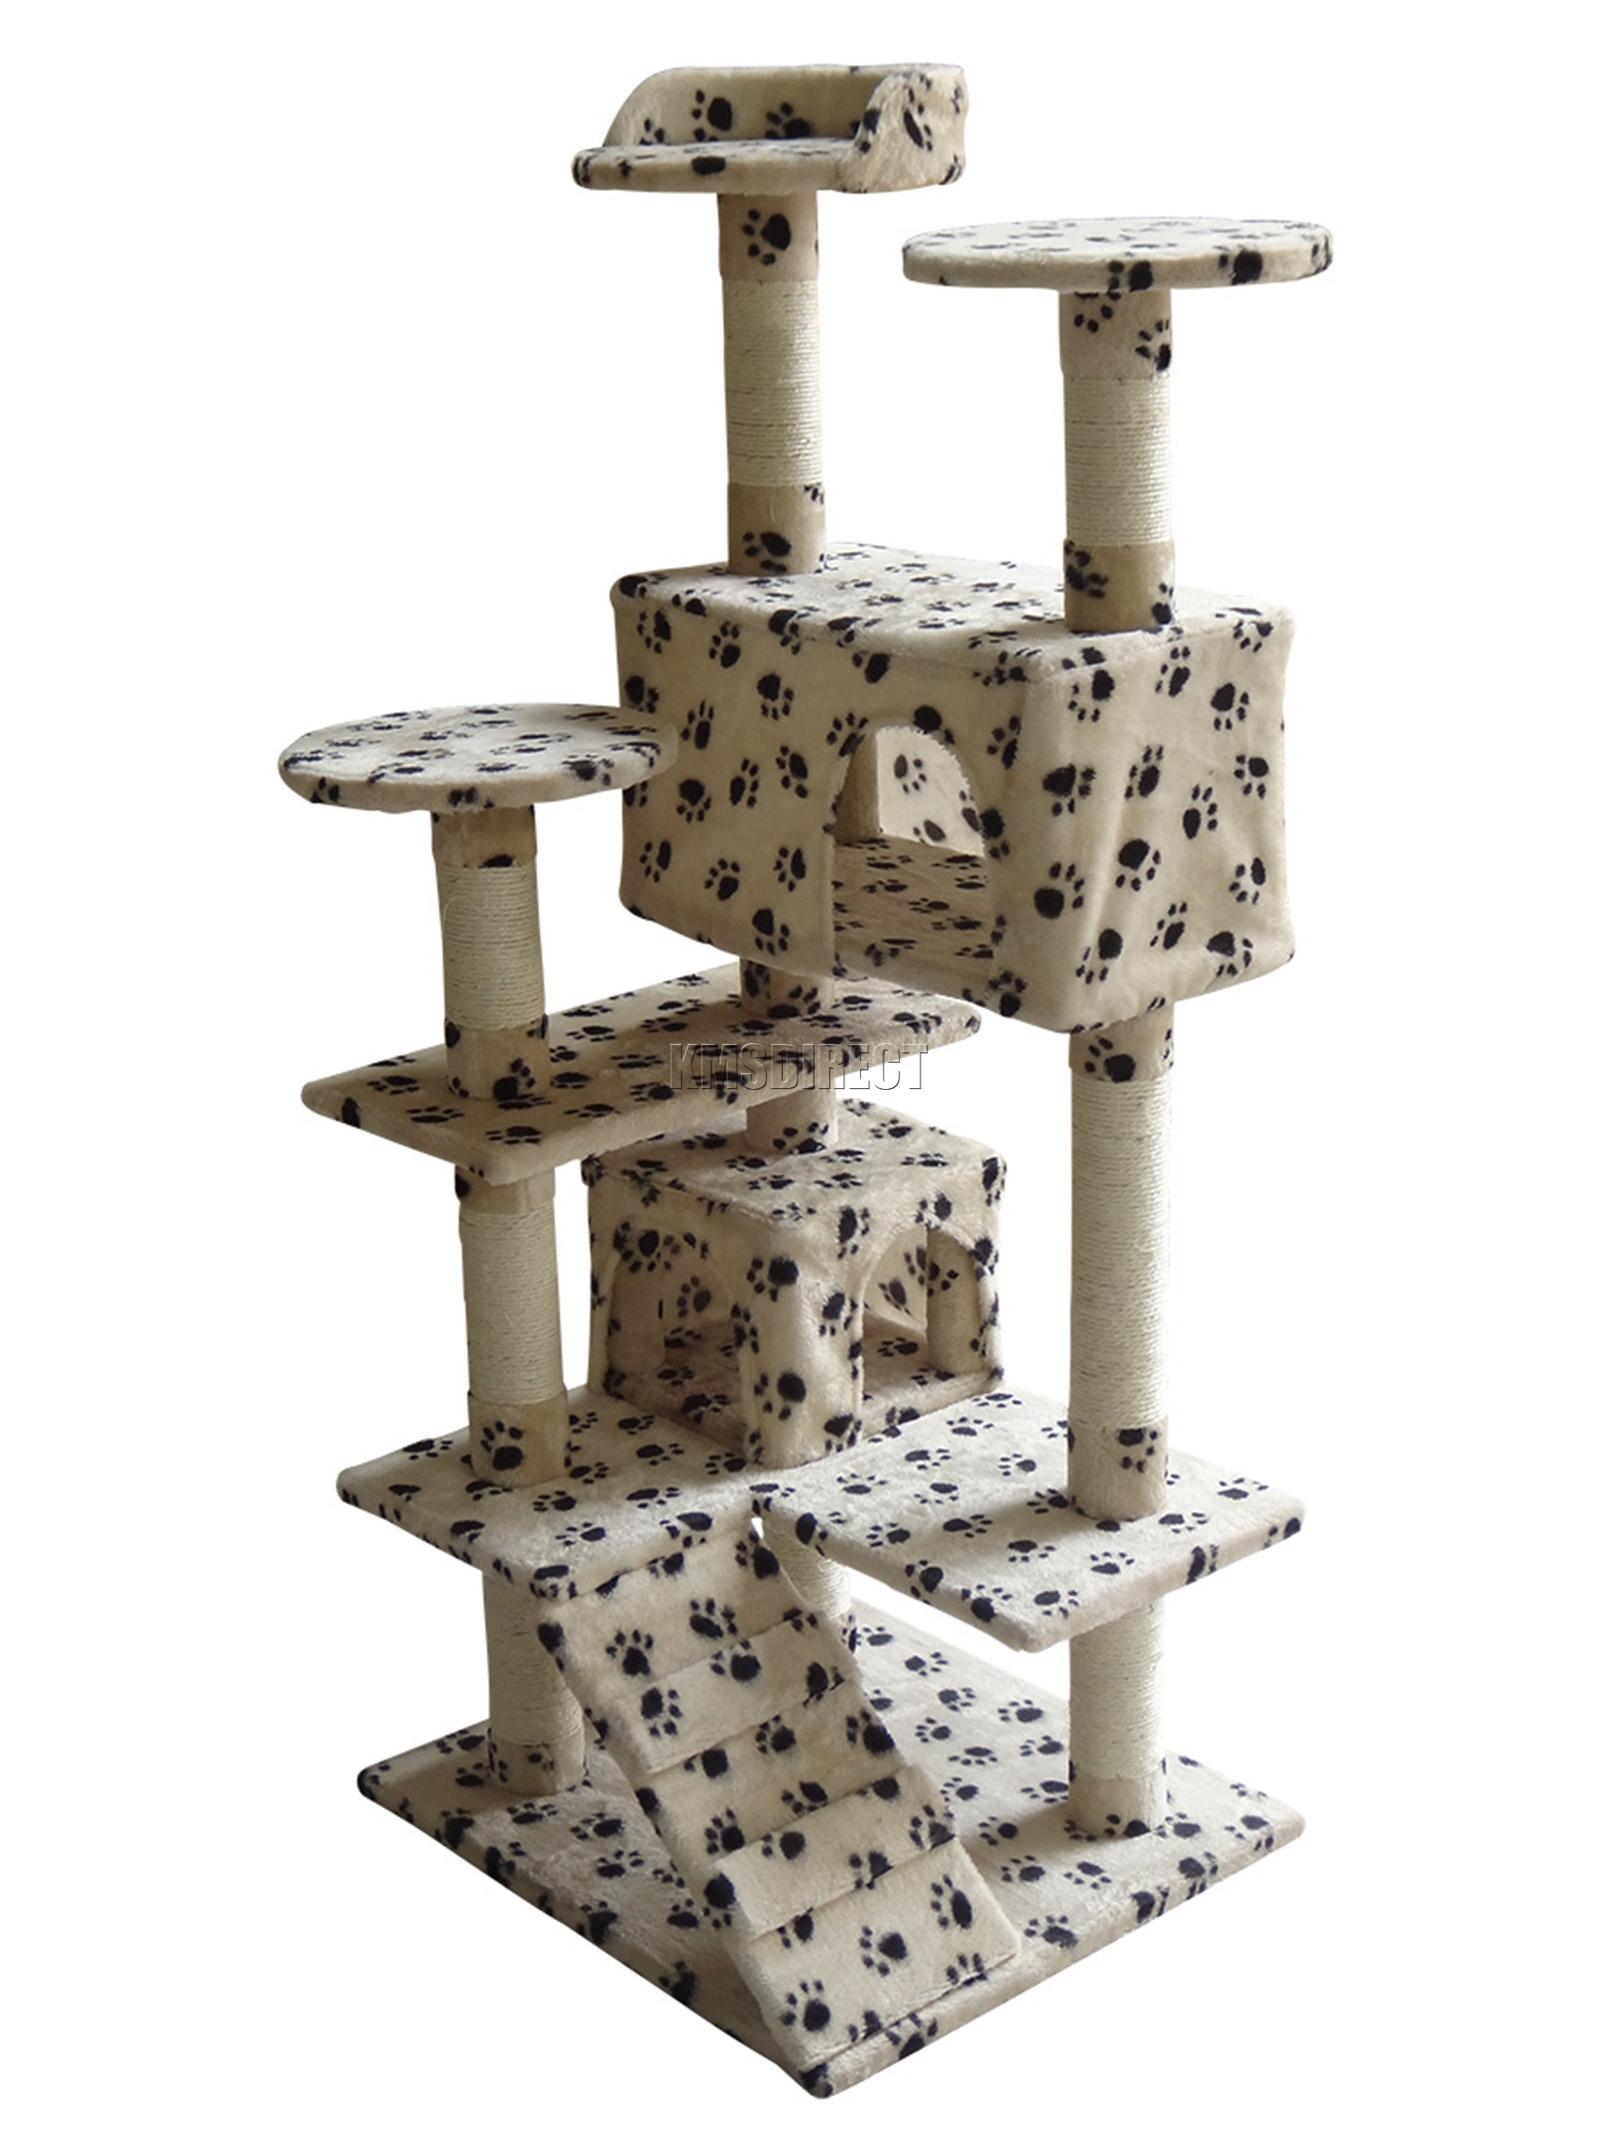 Foxhunter cat kitten post tree scratcher activity centre sisal toy bed cat005 ebay - Cat bed scratcher ...